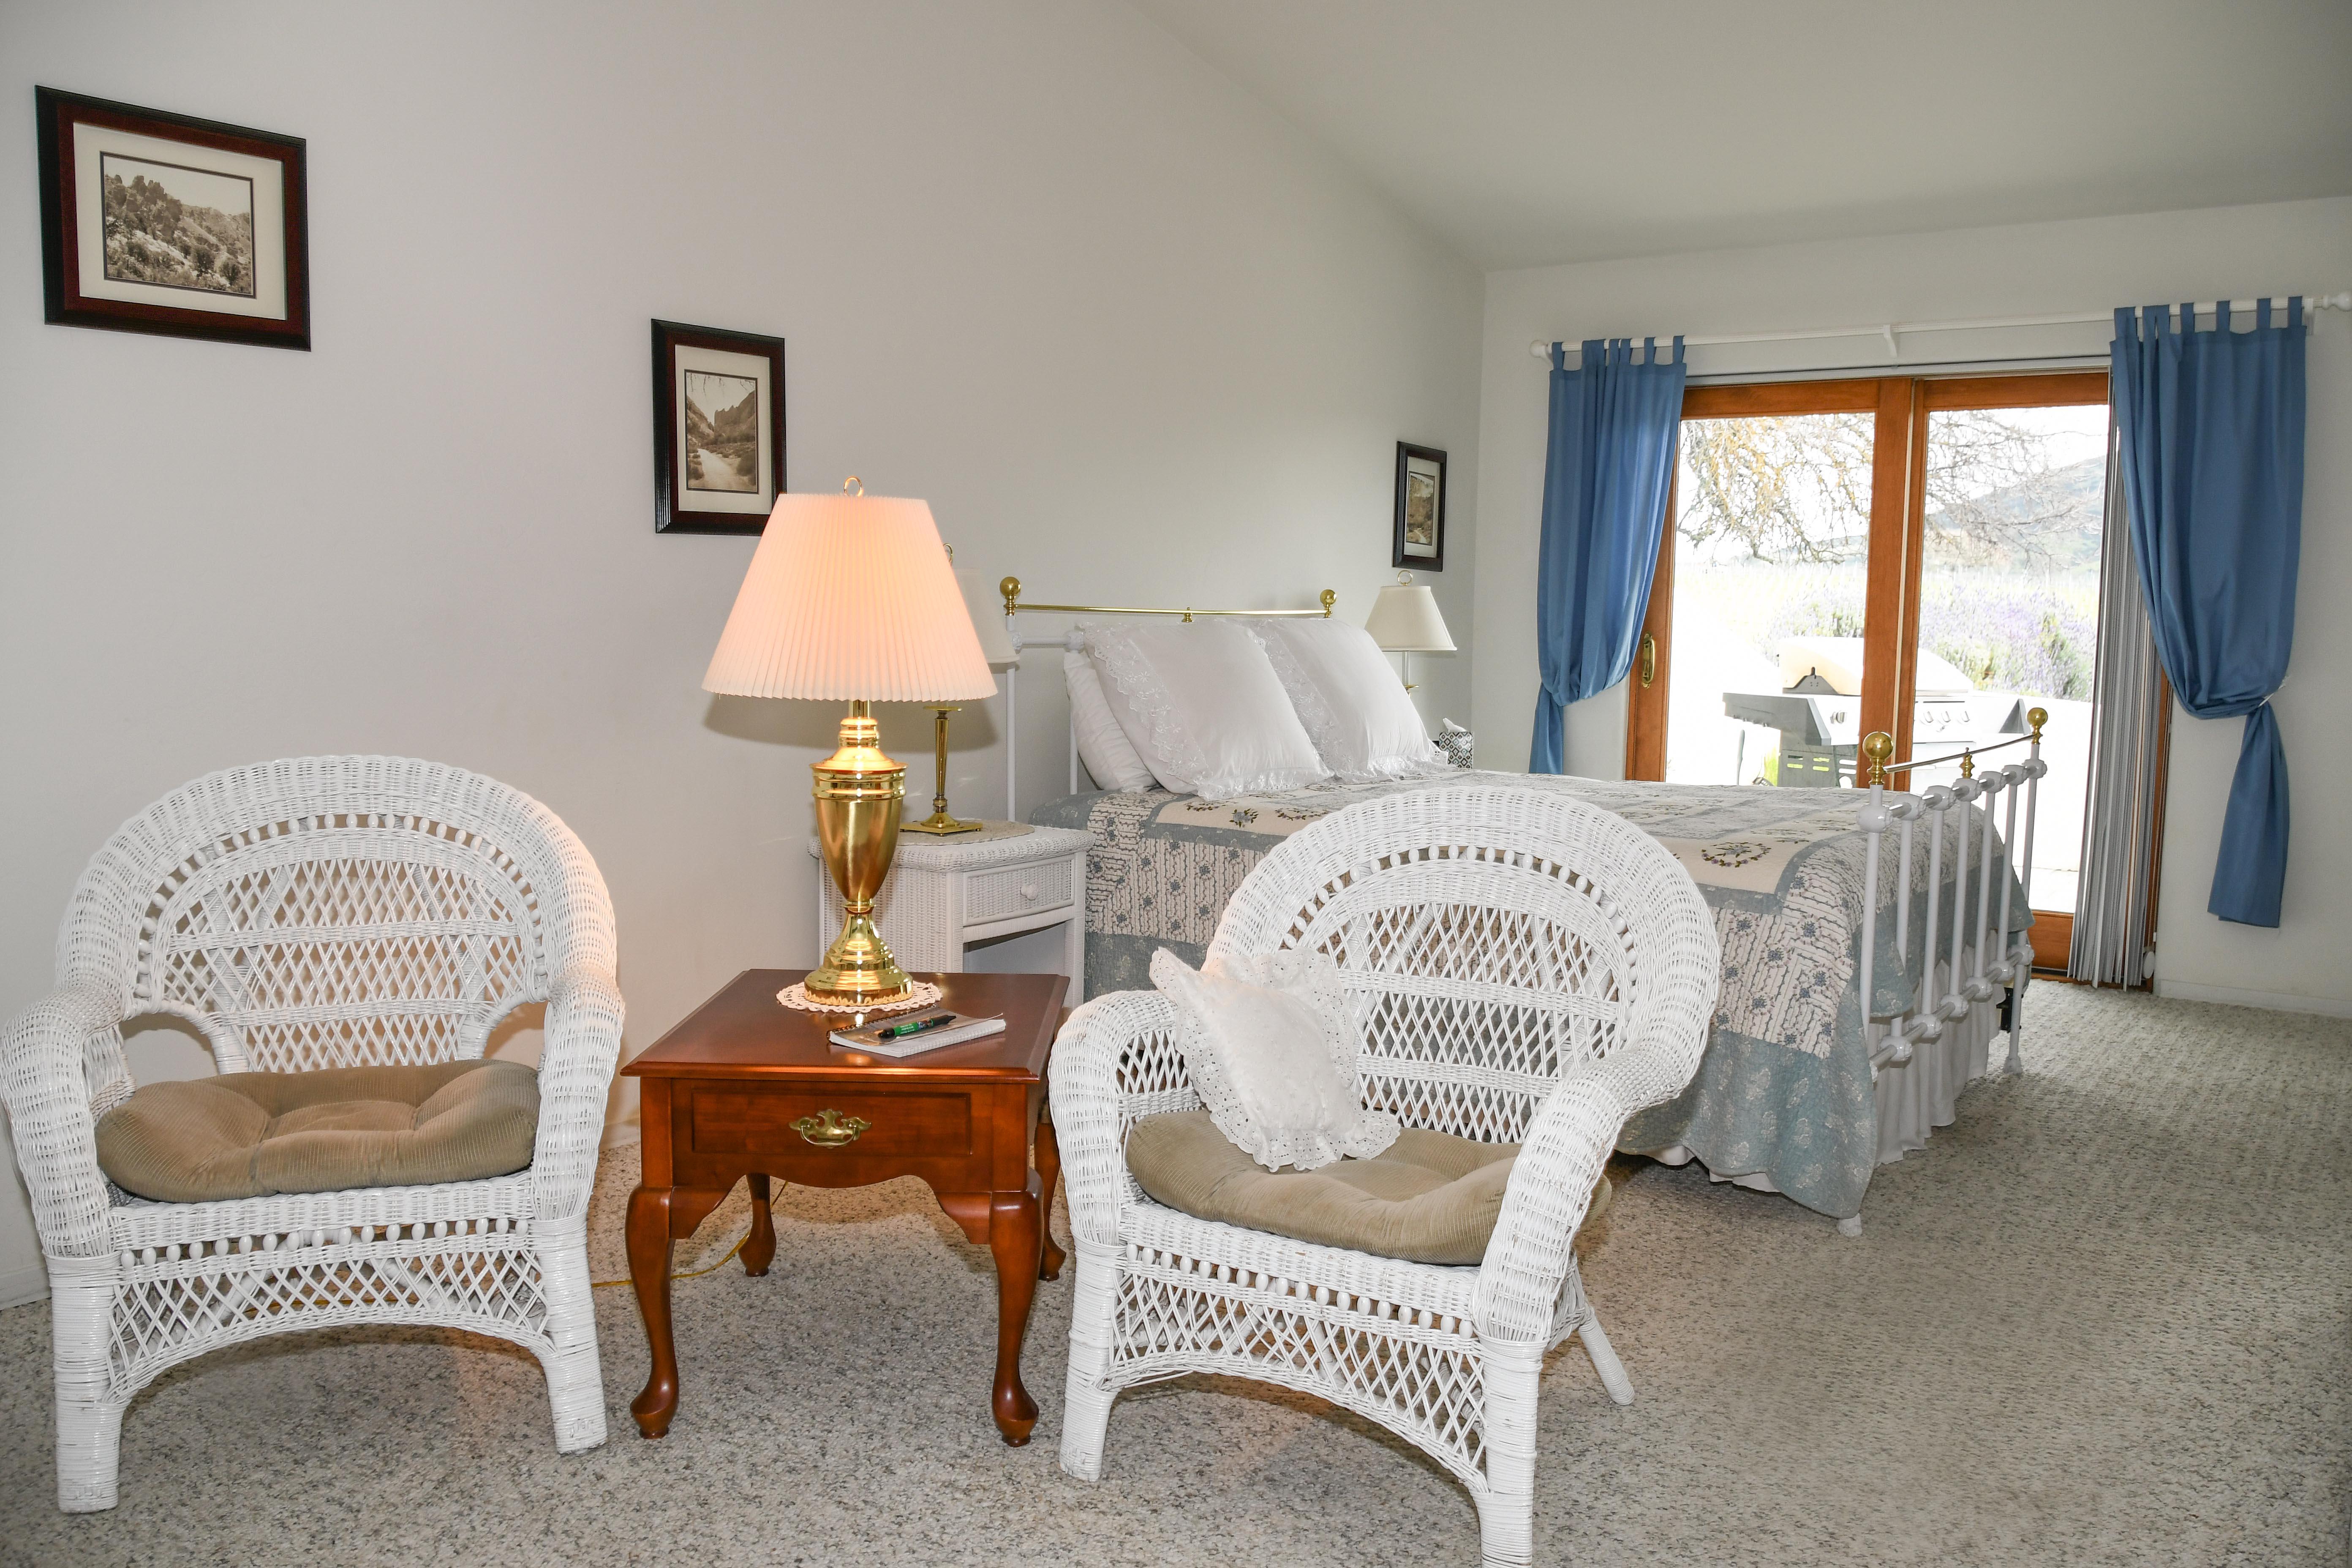 Cottonwood Room 1 | Luxury Bed and Breakfast Inn